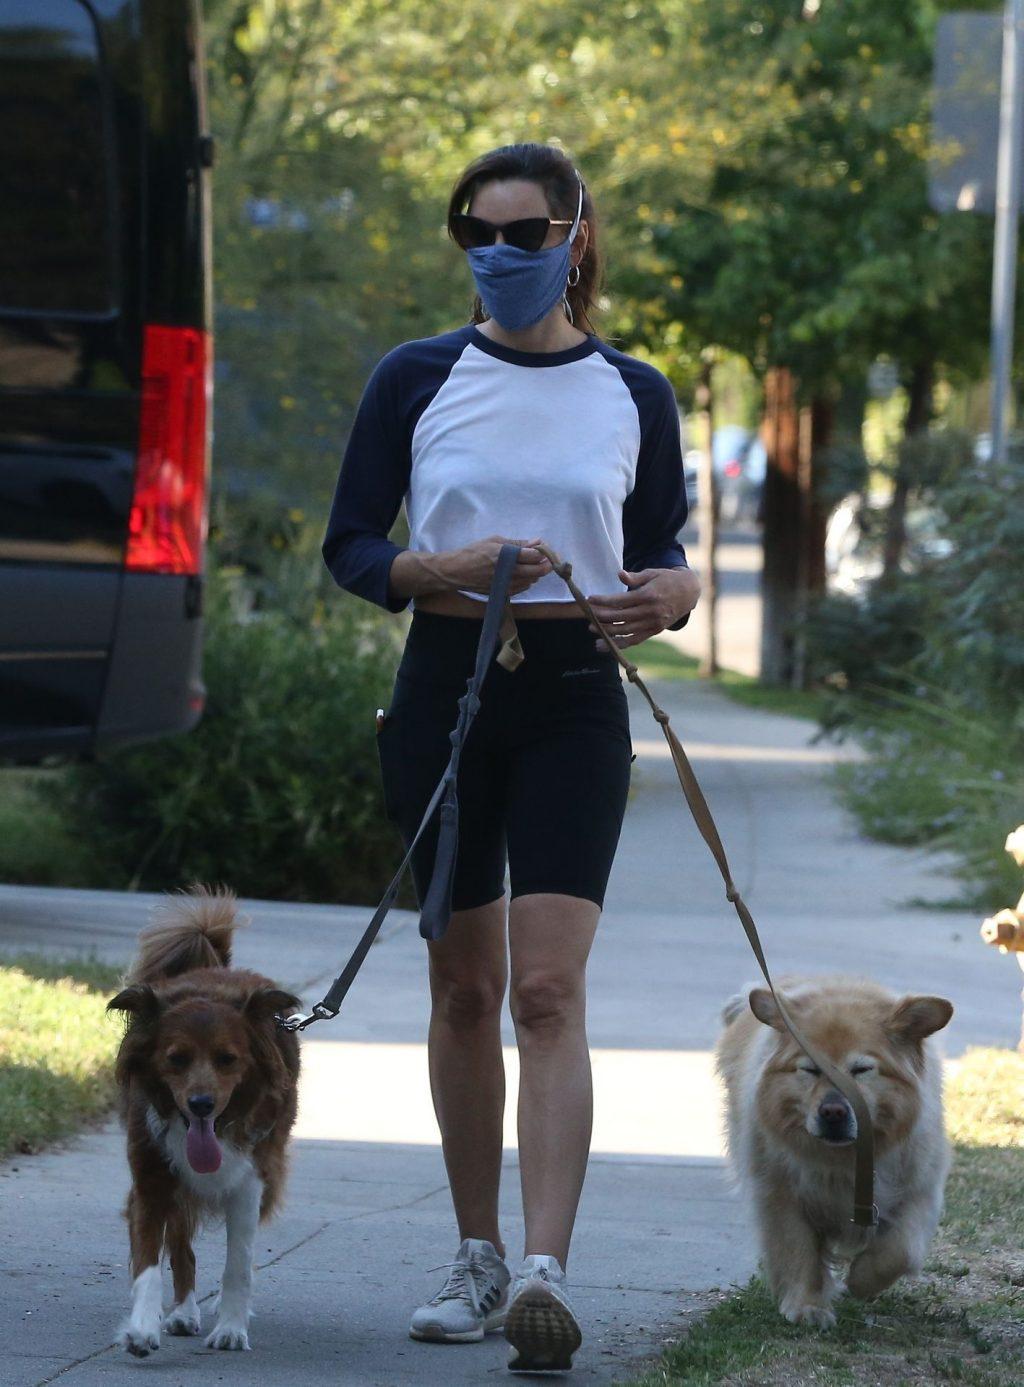 Braless Aubrey Plaza Walks Her Dogs with a Girlfriend (16 Photos)